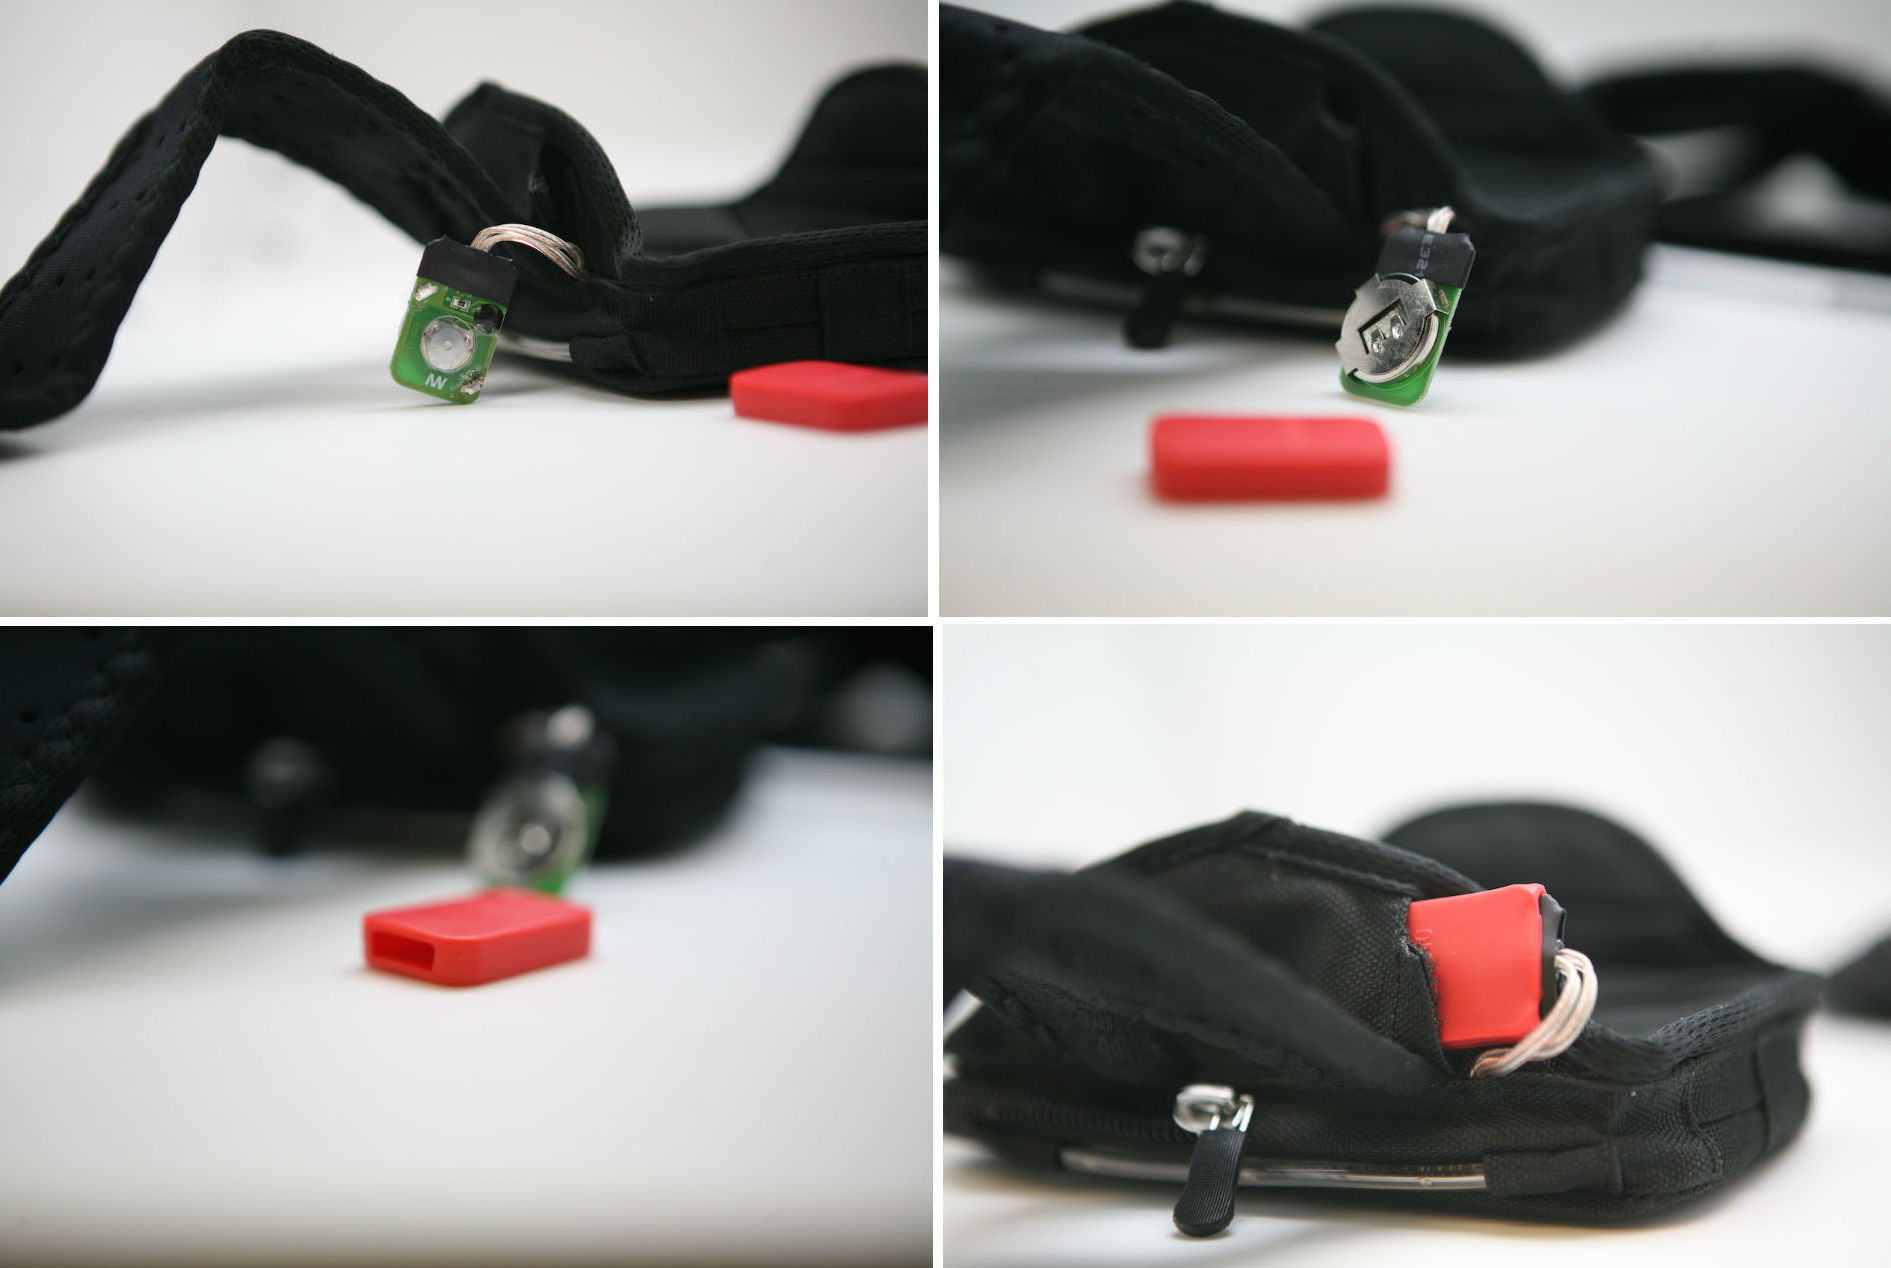 Сверкающий чехол для смартфонов: знакомимся с брендом Armpocket - 8